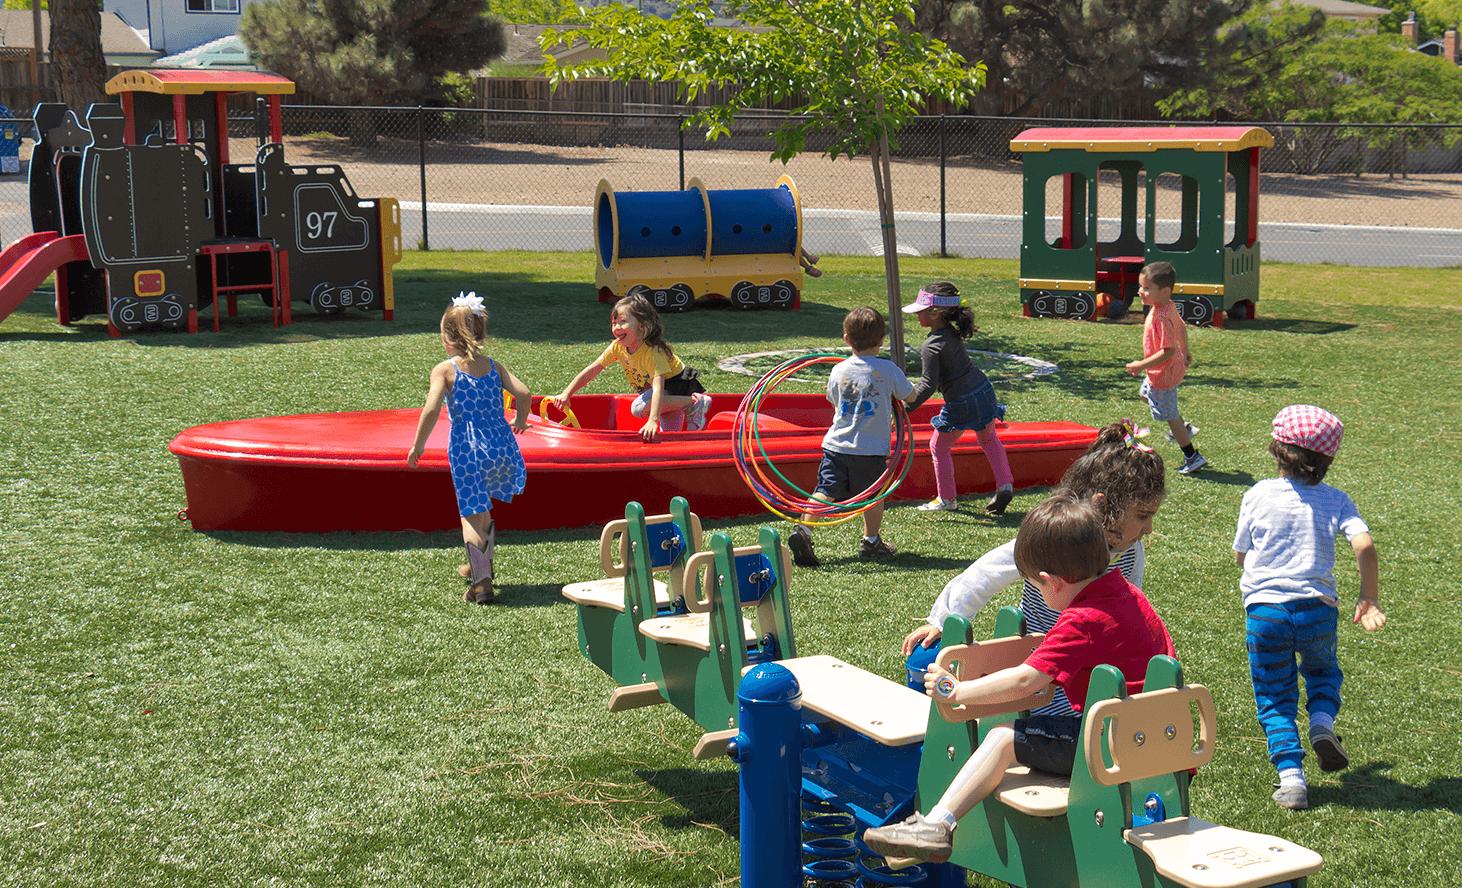 Preschool Playground | Challenger School - Harwood | Private School In San Jose, California